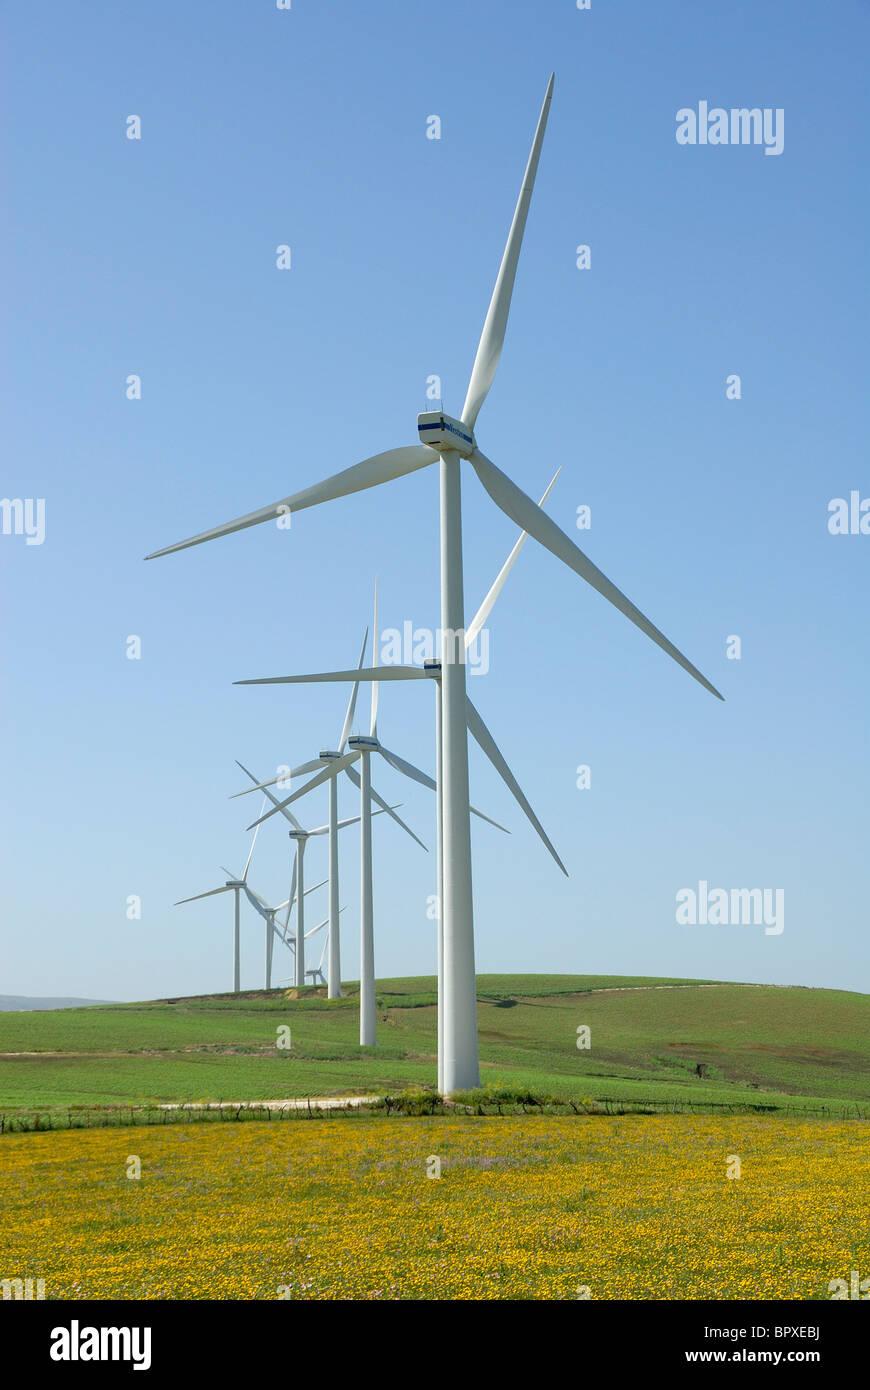 Wind farm Ecological power Spain Wild flowers wind energy industry - Stock Image